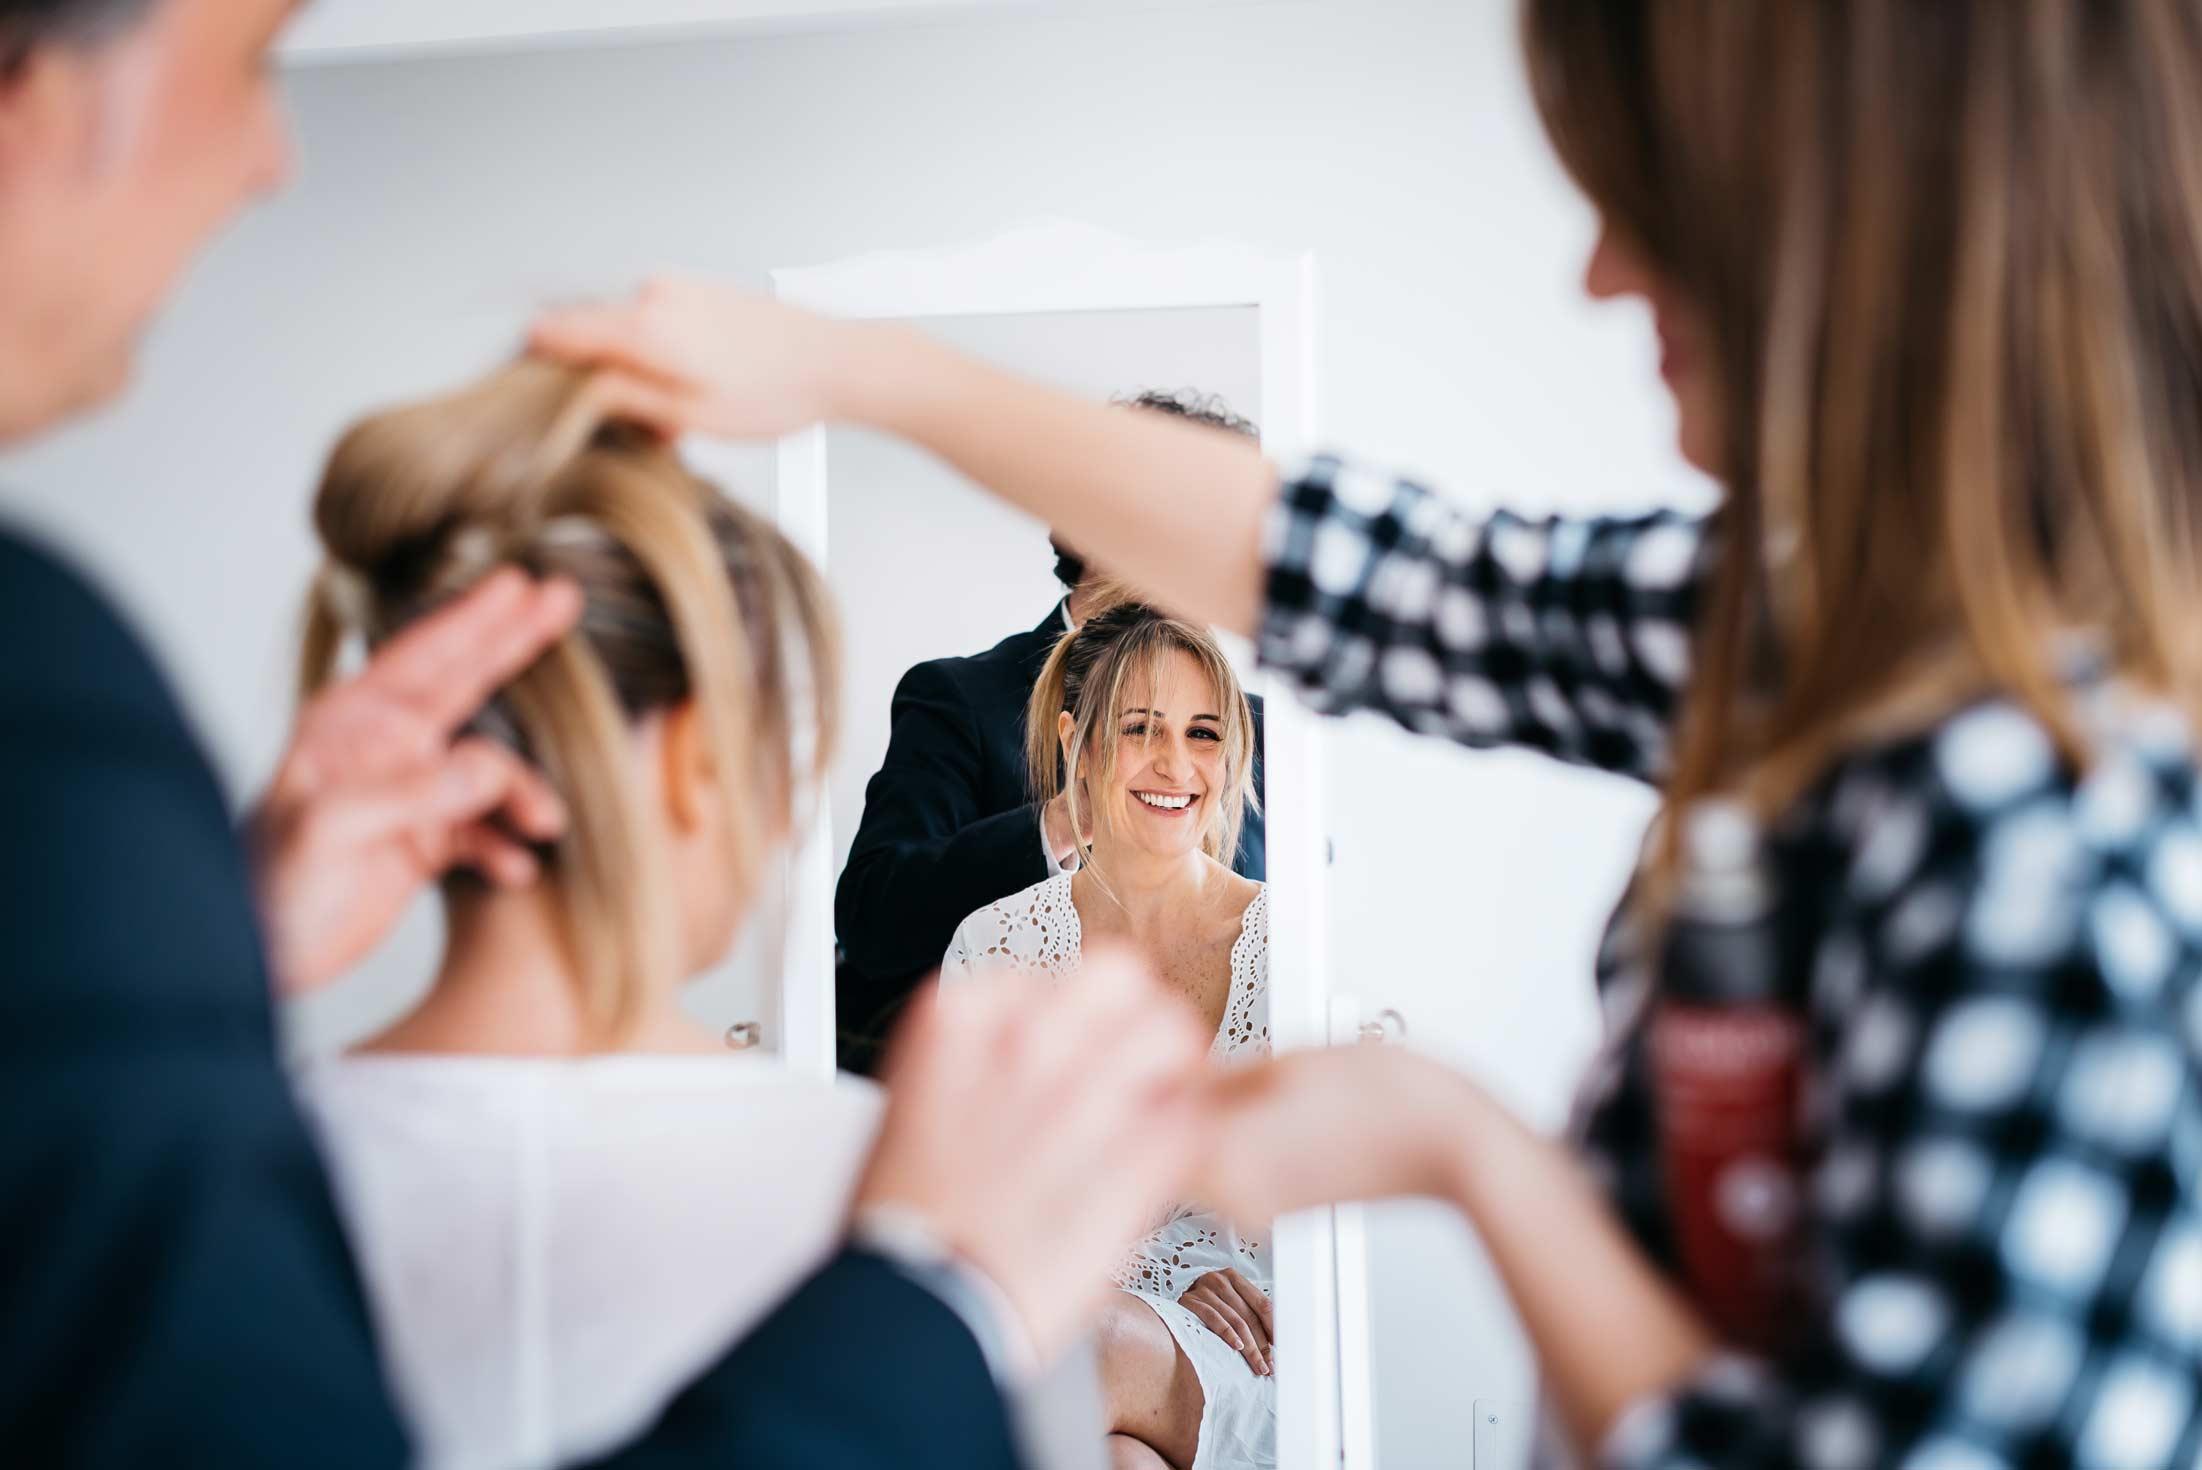 Matrimonio-Fotografo-Stile-Reportage-Preparativi-Sposa